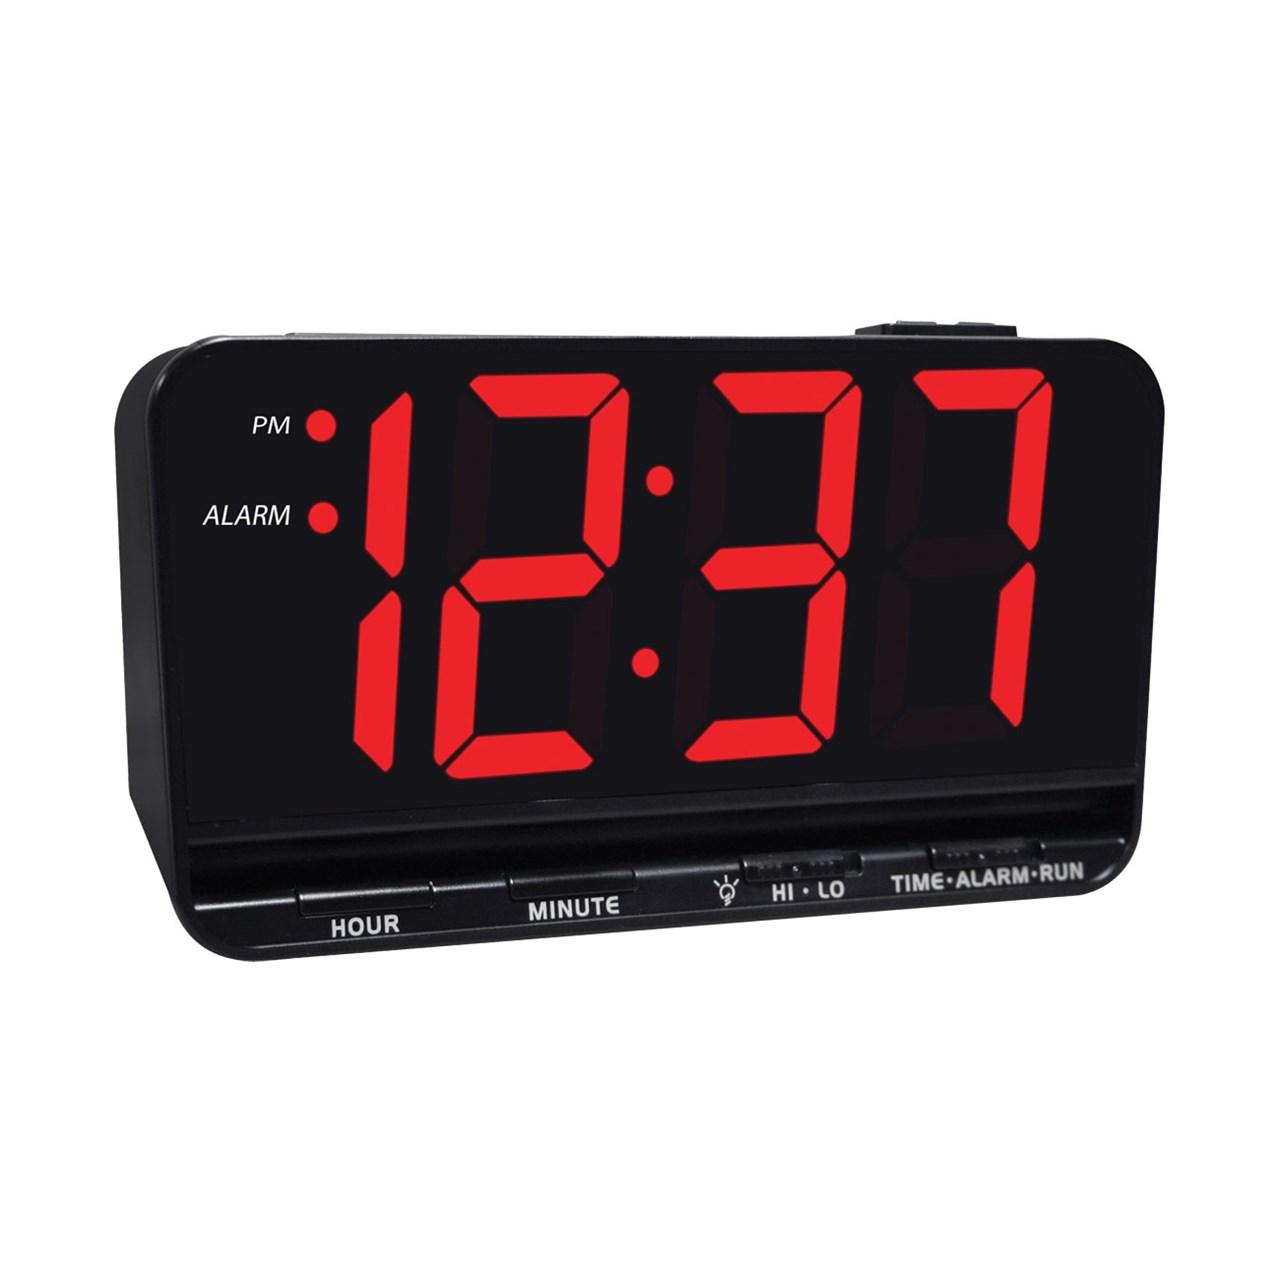 MaxiAids | Jumbo Display Digital Alarm Clock with 3-inch LED